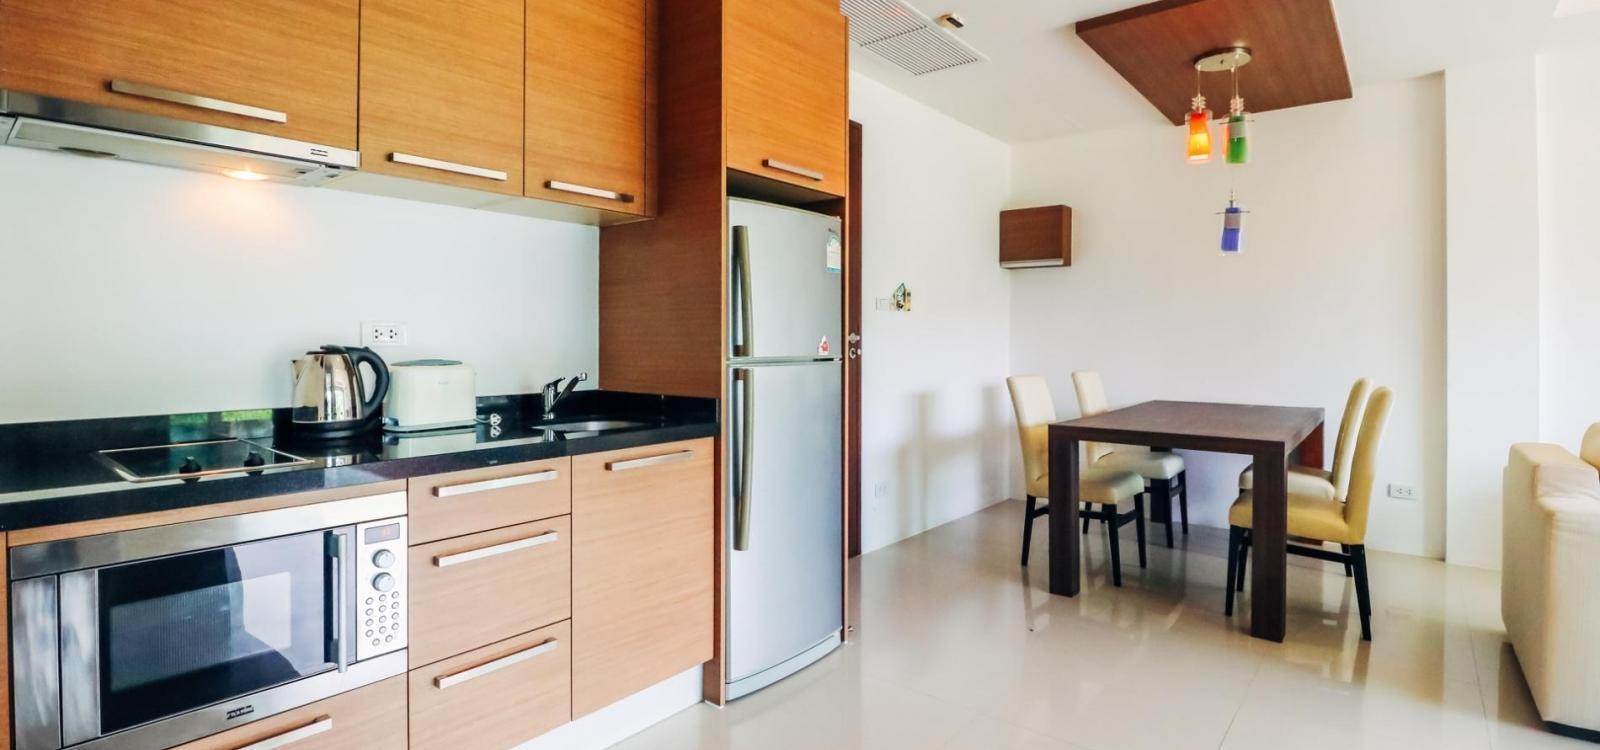 BT213 - Tropical apartment close to beach